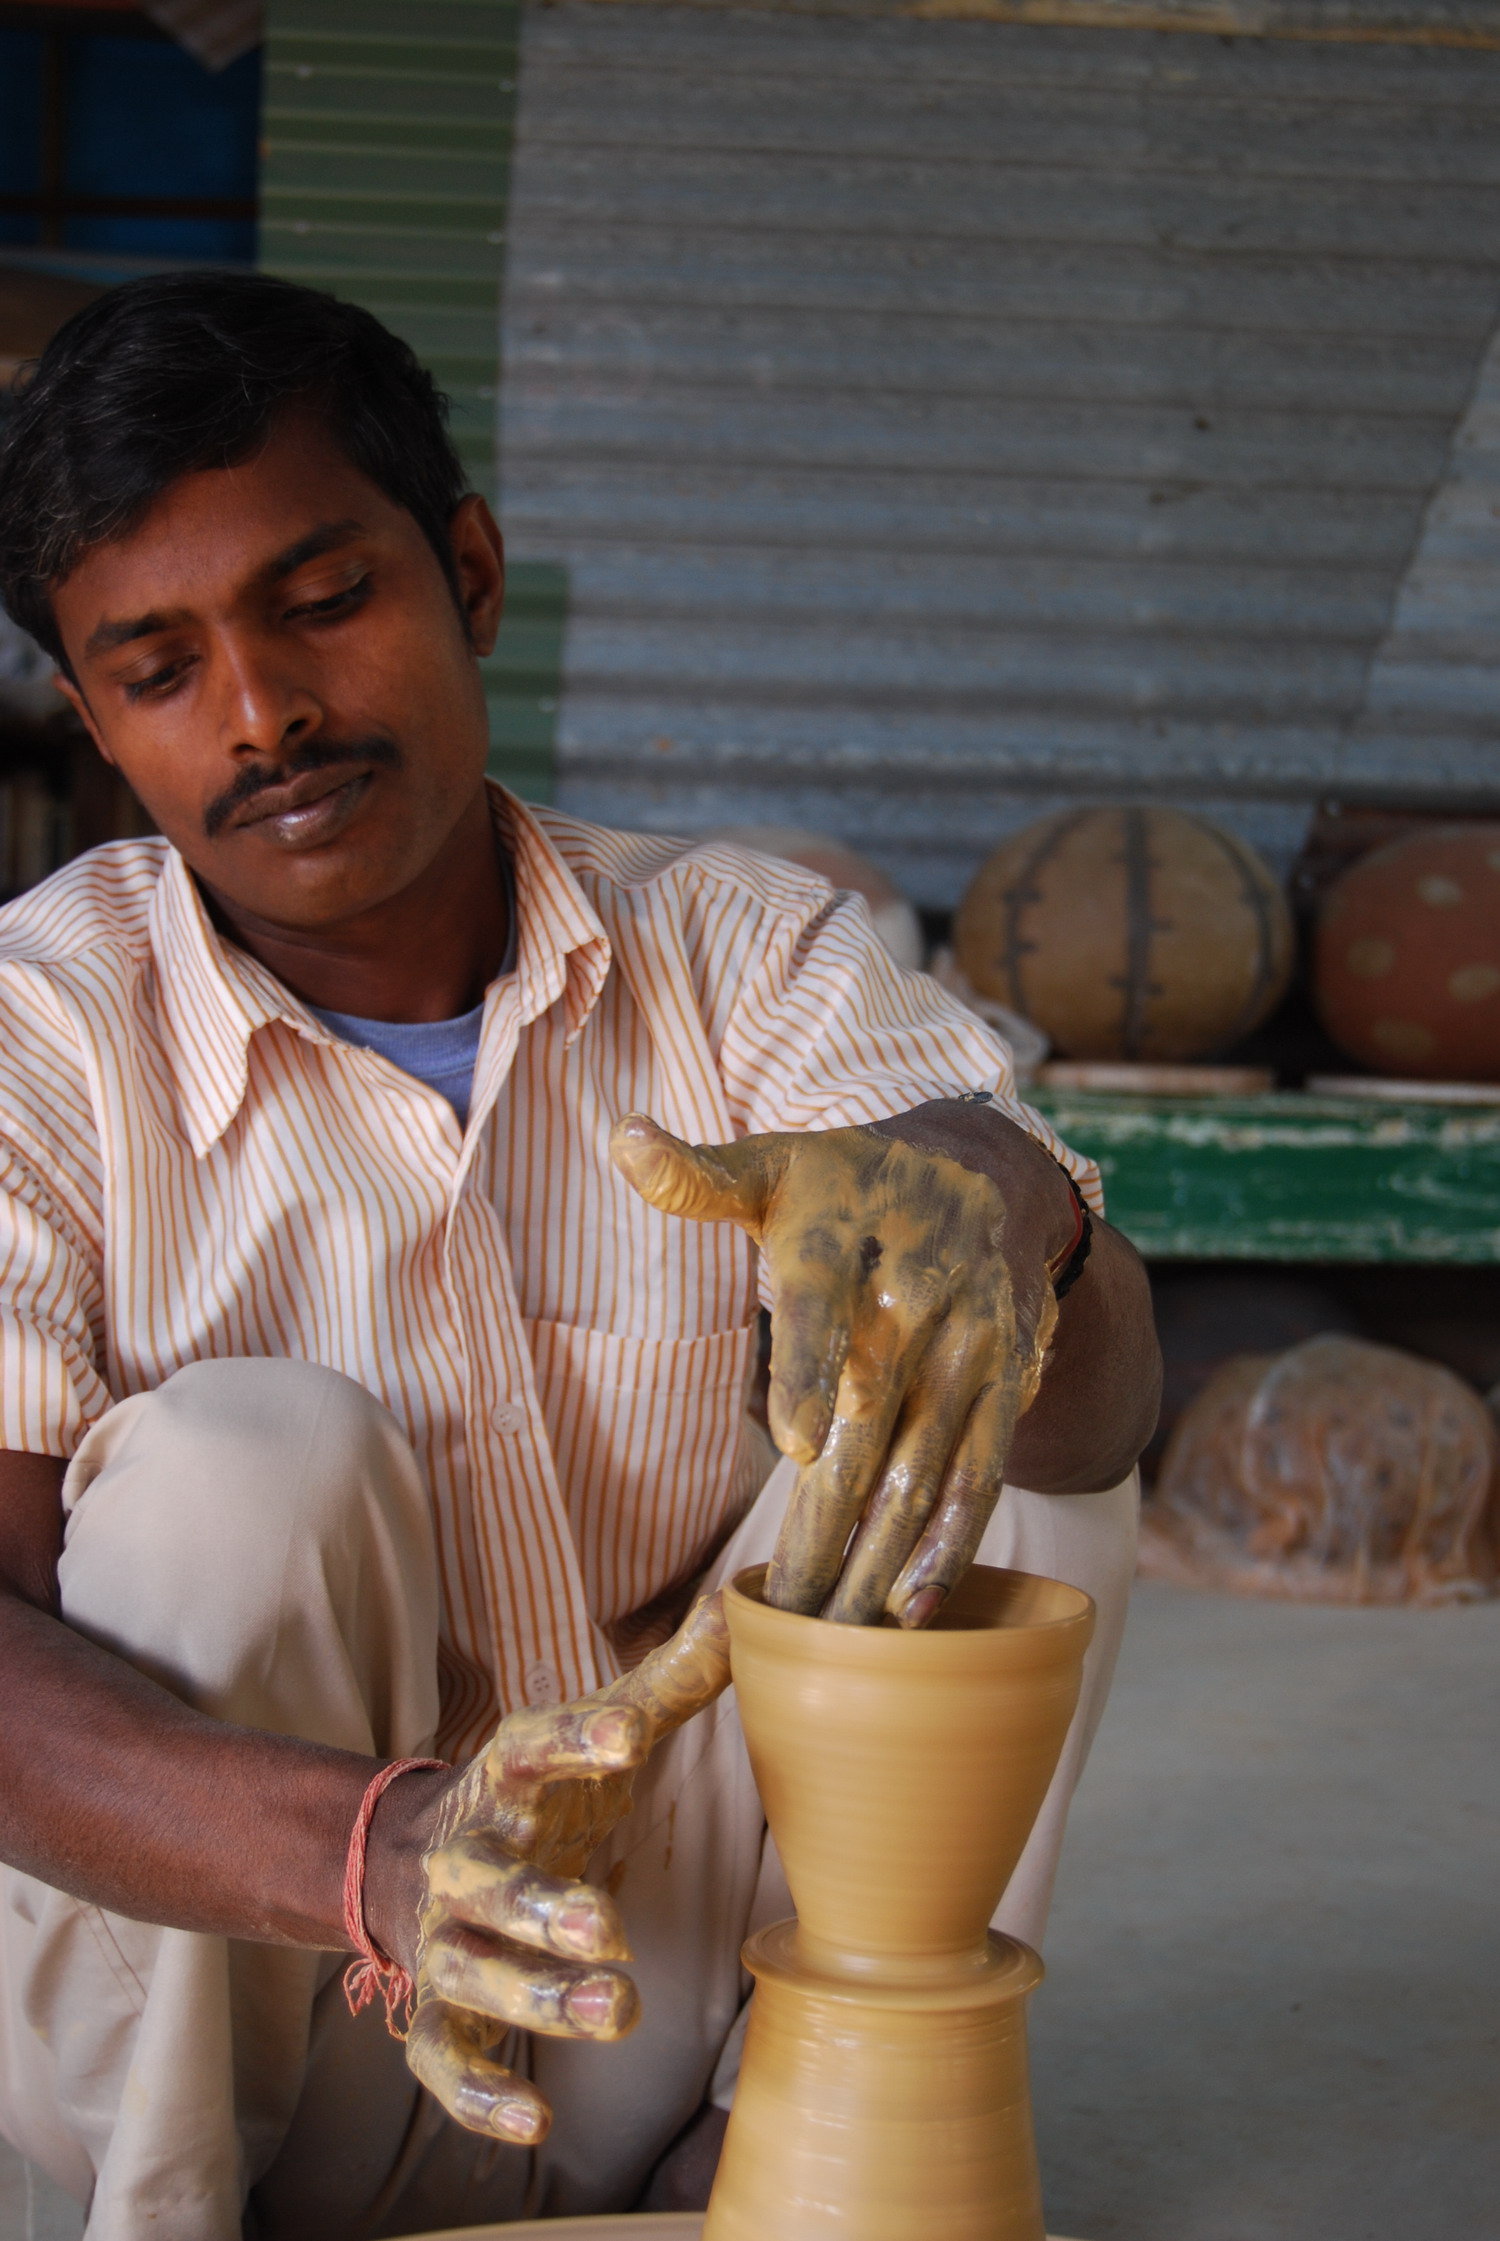 Banay Singh finishing lip on a chai cup.